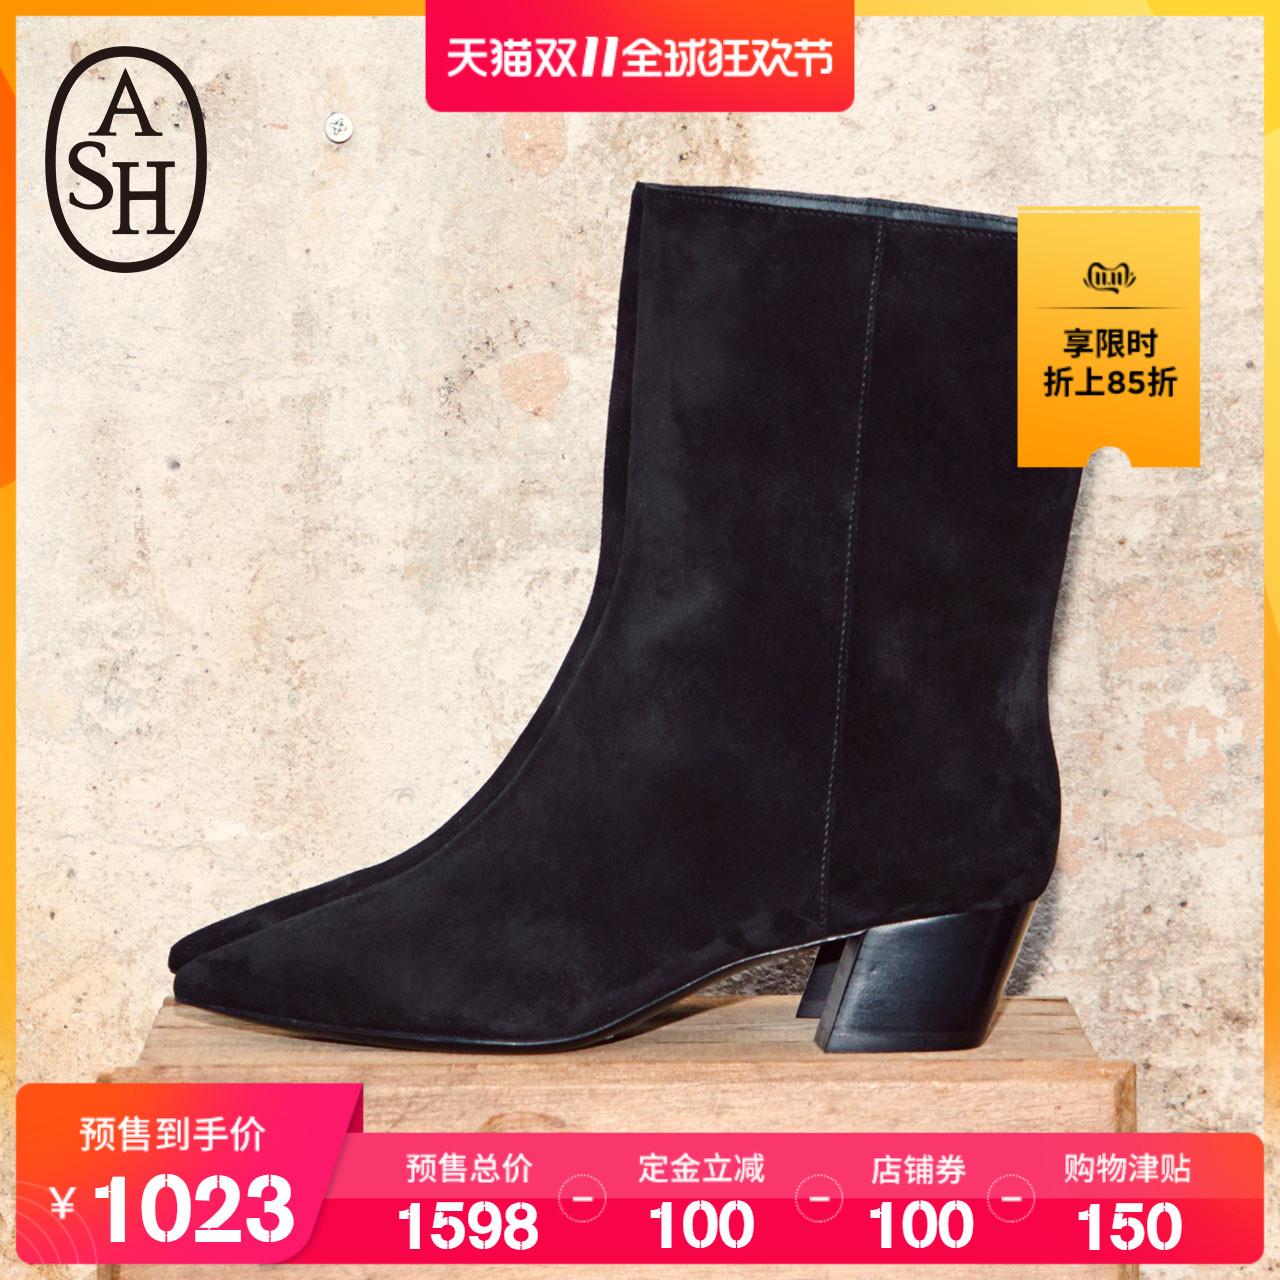 ASH女鞋秋冬新款CARLA复古粗跟尖头短靴内侧拉链设计 thumbnail